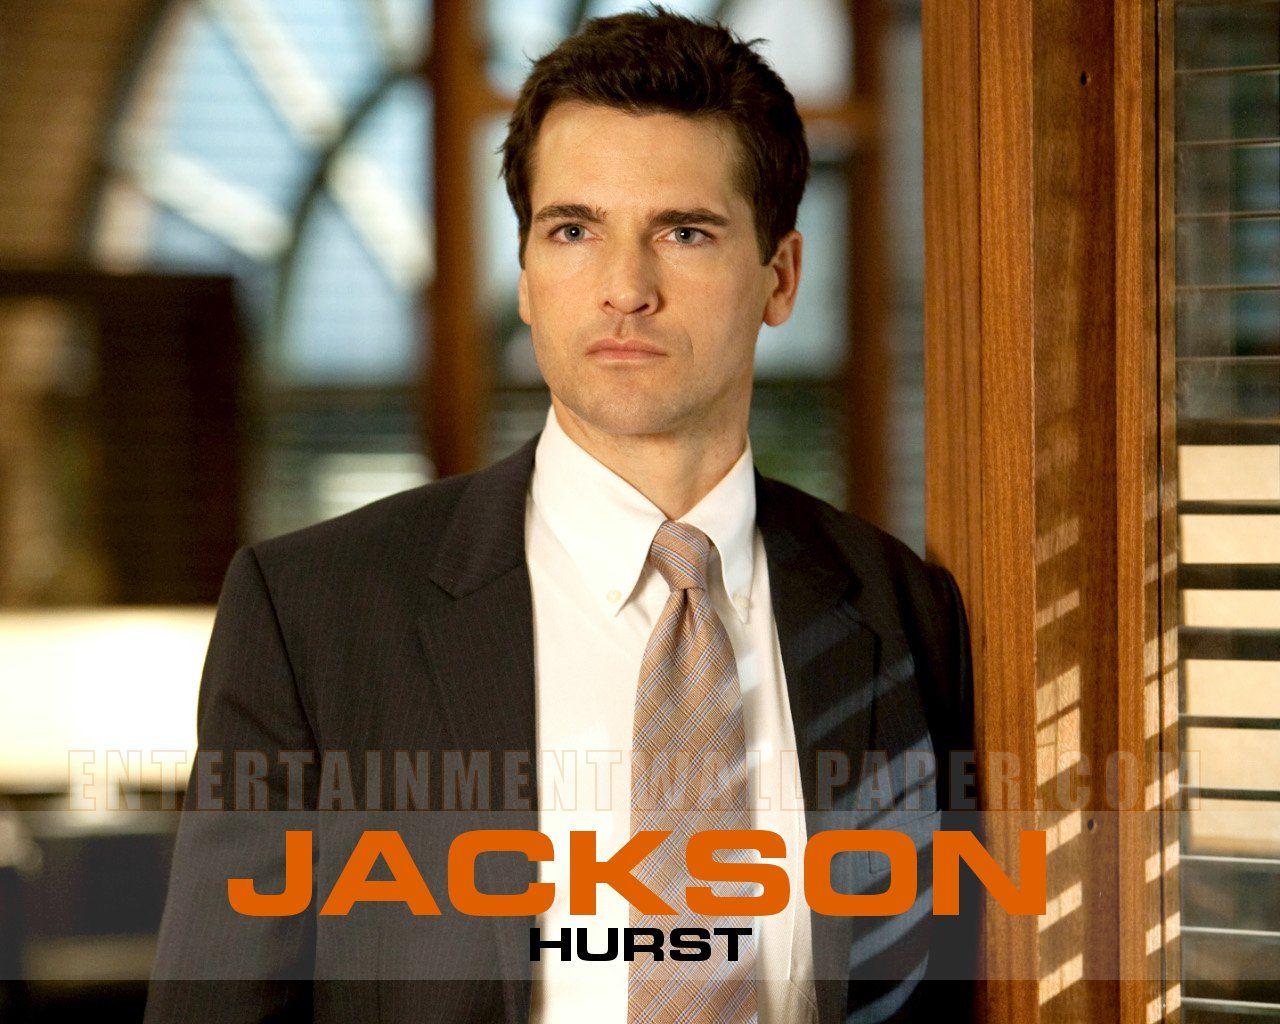 jackson hurst wife